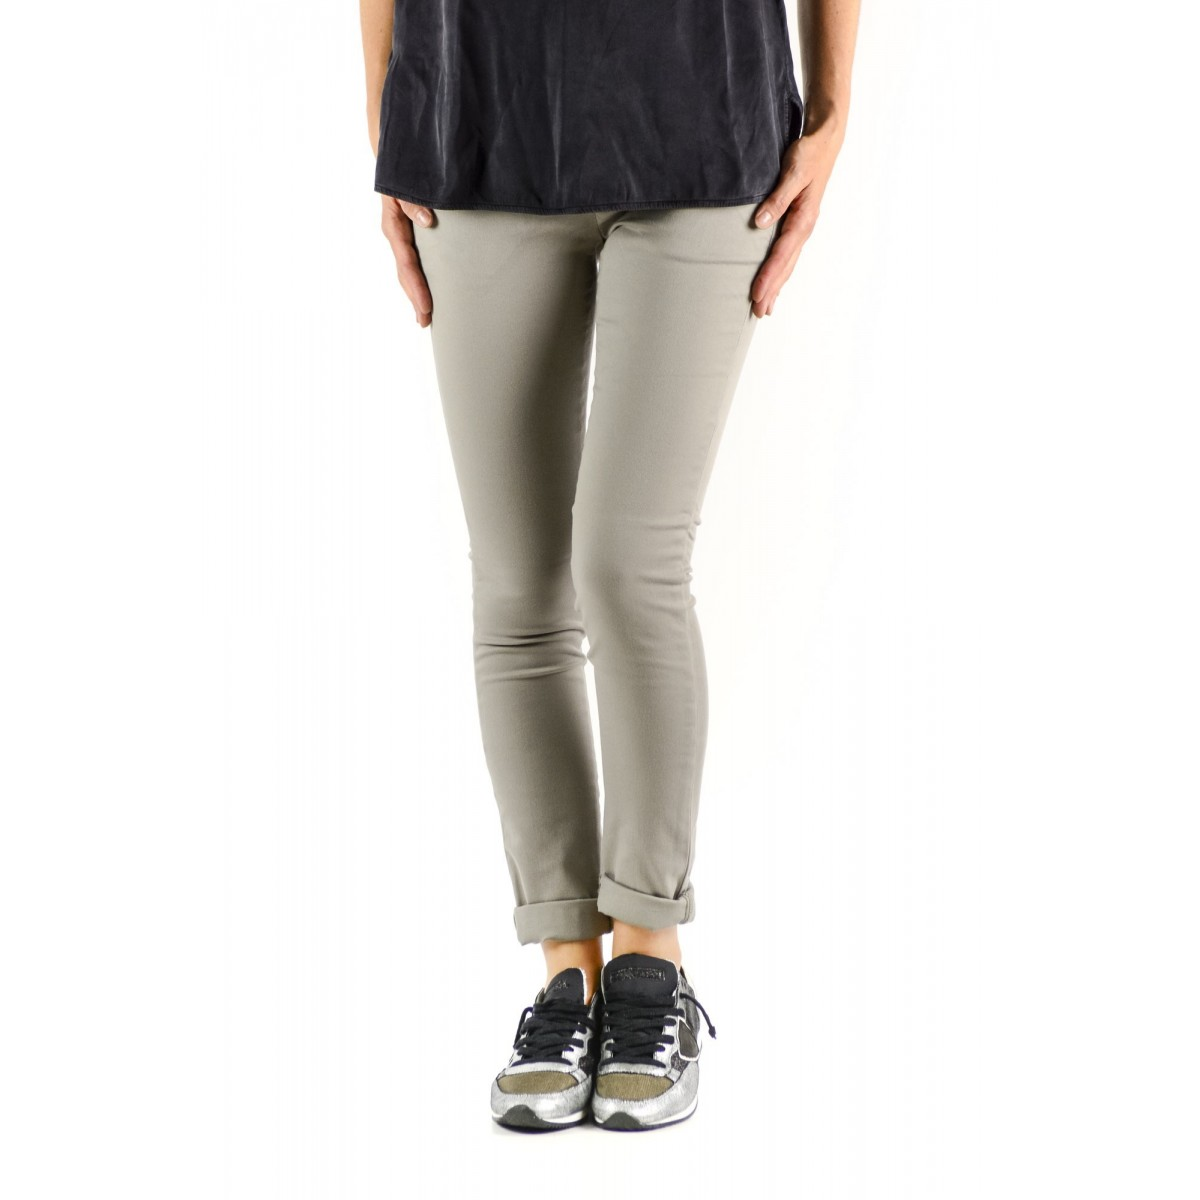 Pantalone Ralph Lauren Donna - V44Iobokt5212